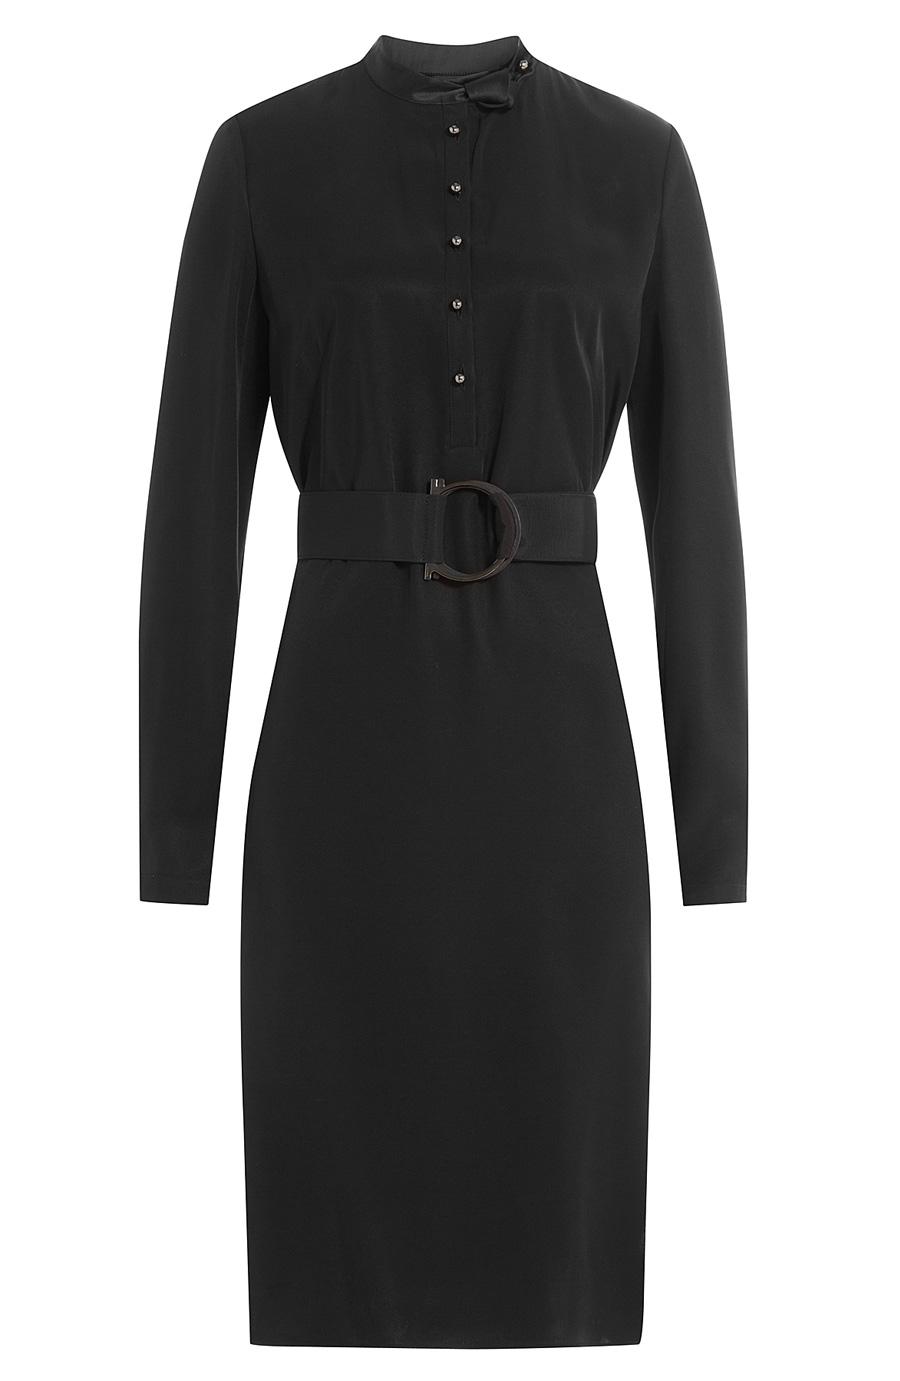 Salvatore Ferragamo Belted Dress In Black